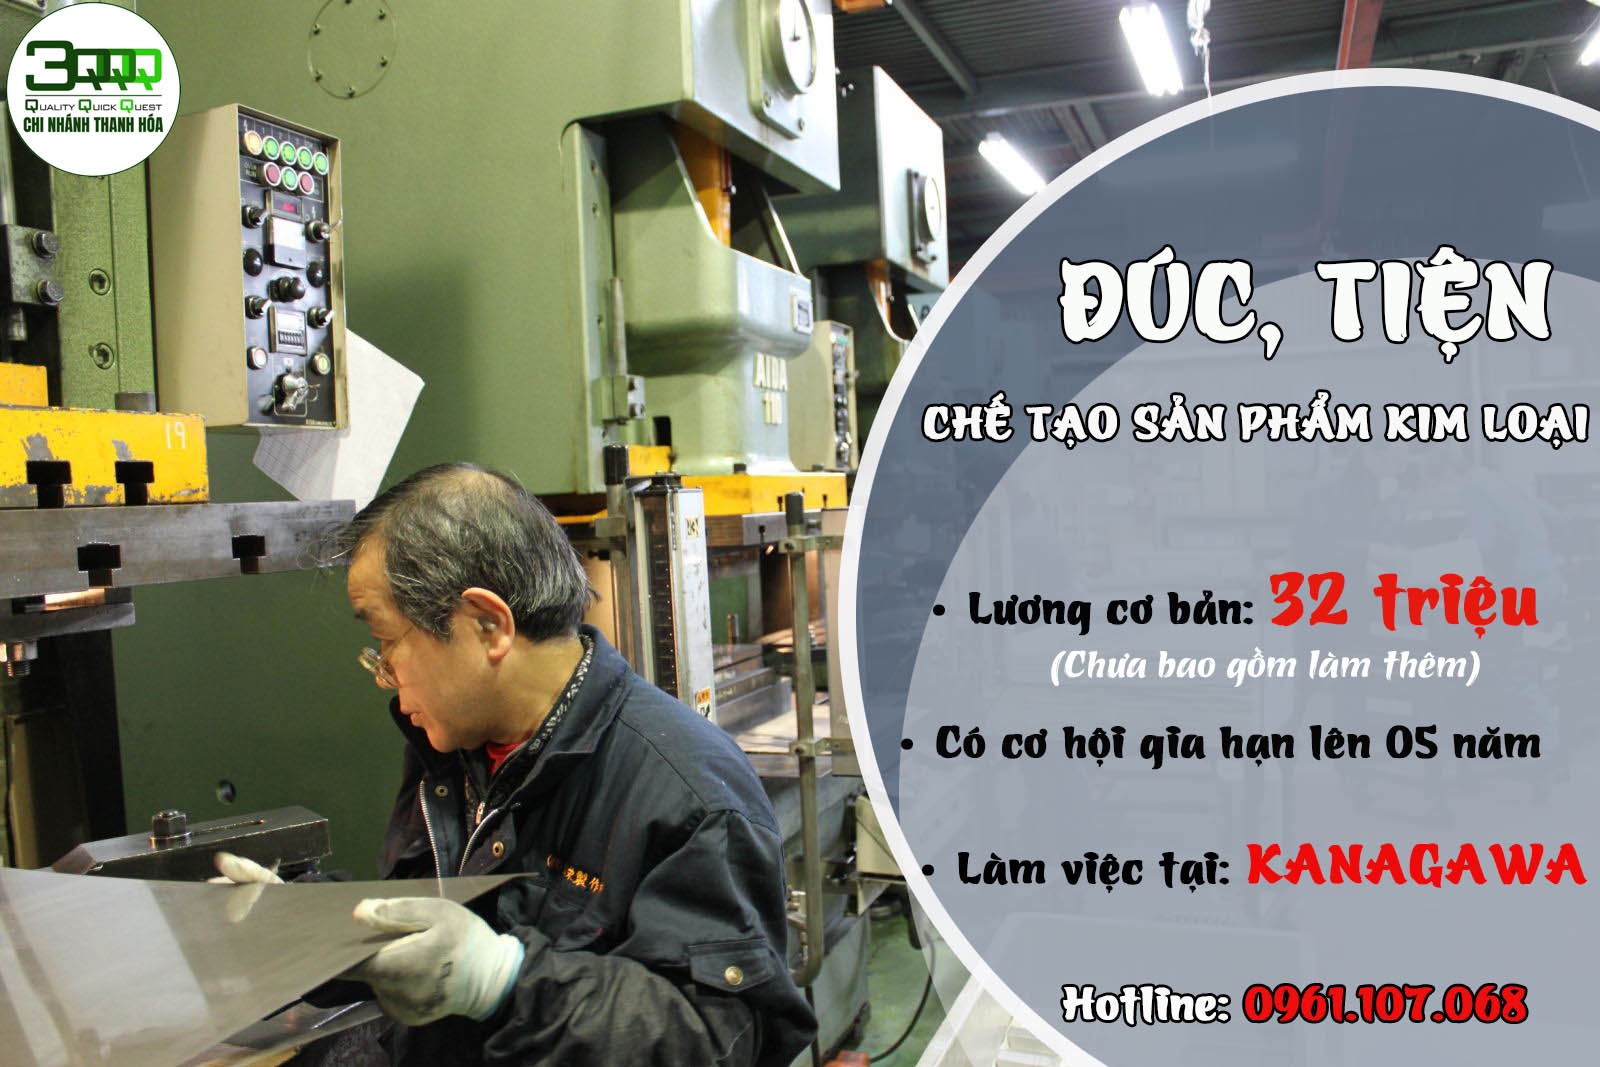 duc-tien-che-tao-san-pham-bang-kim-loai